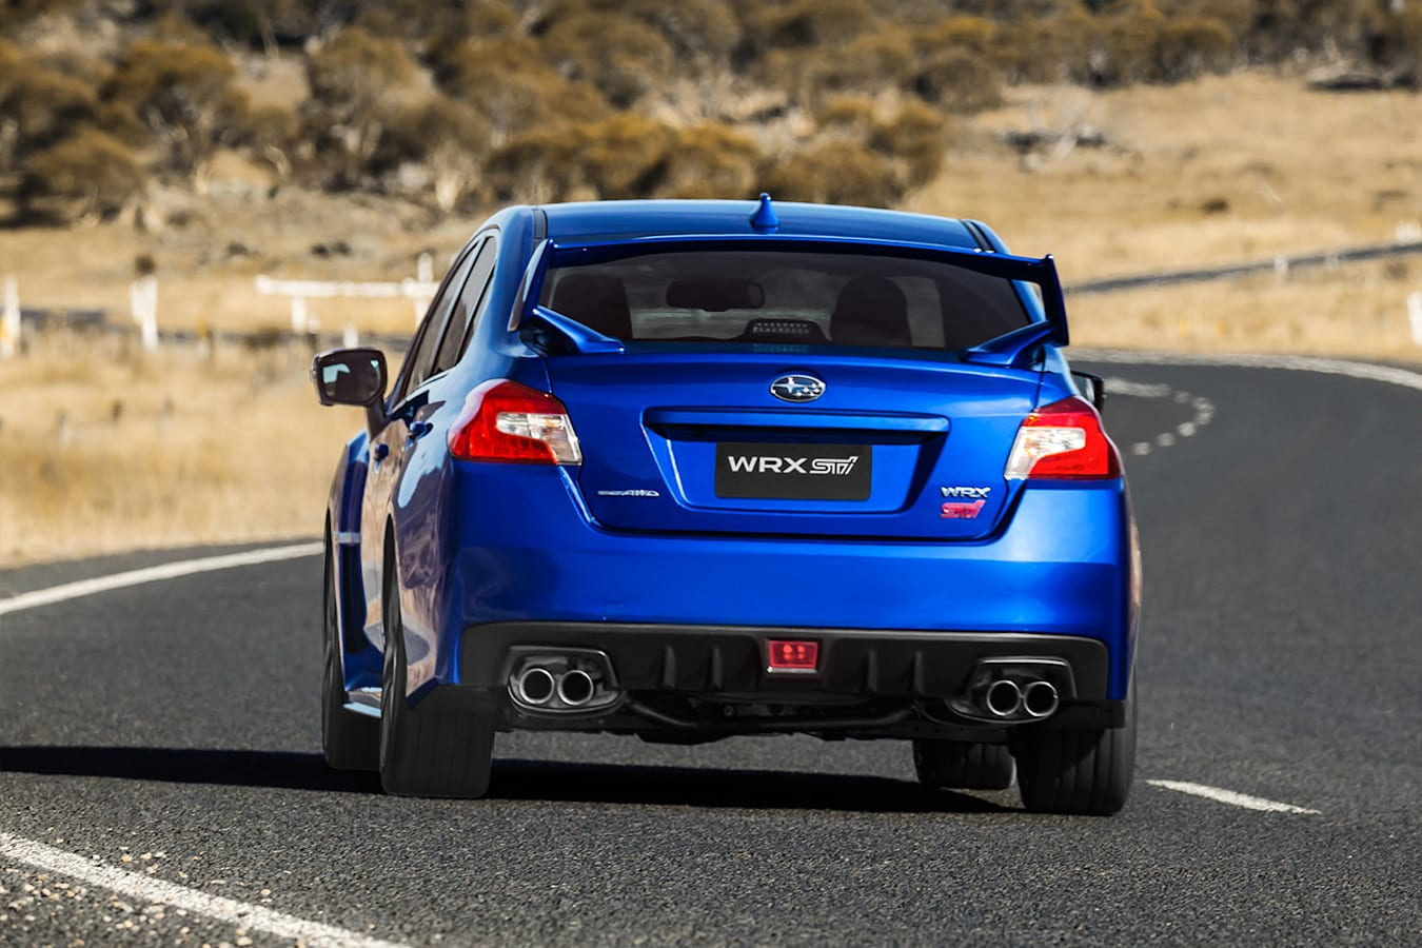 Subaru Wrx Sti Rear Static Jpg